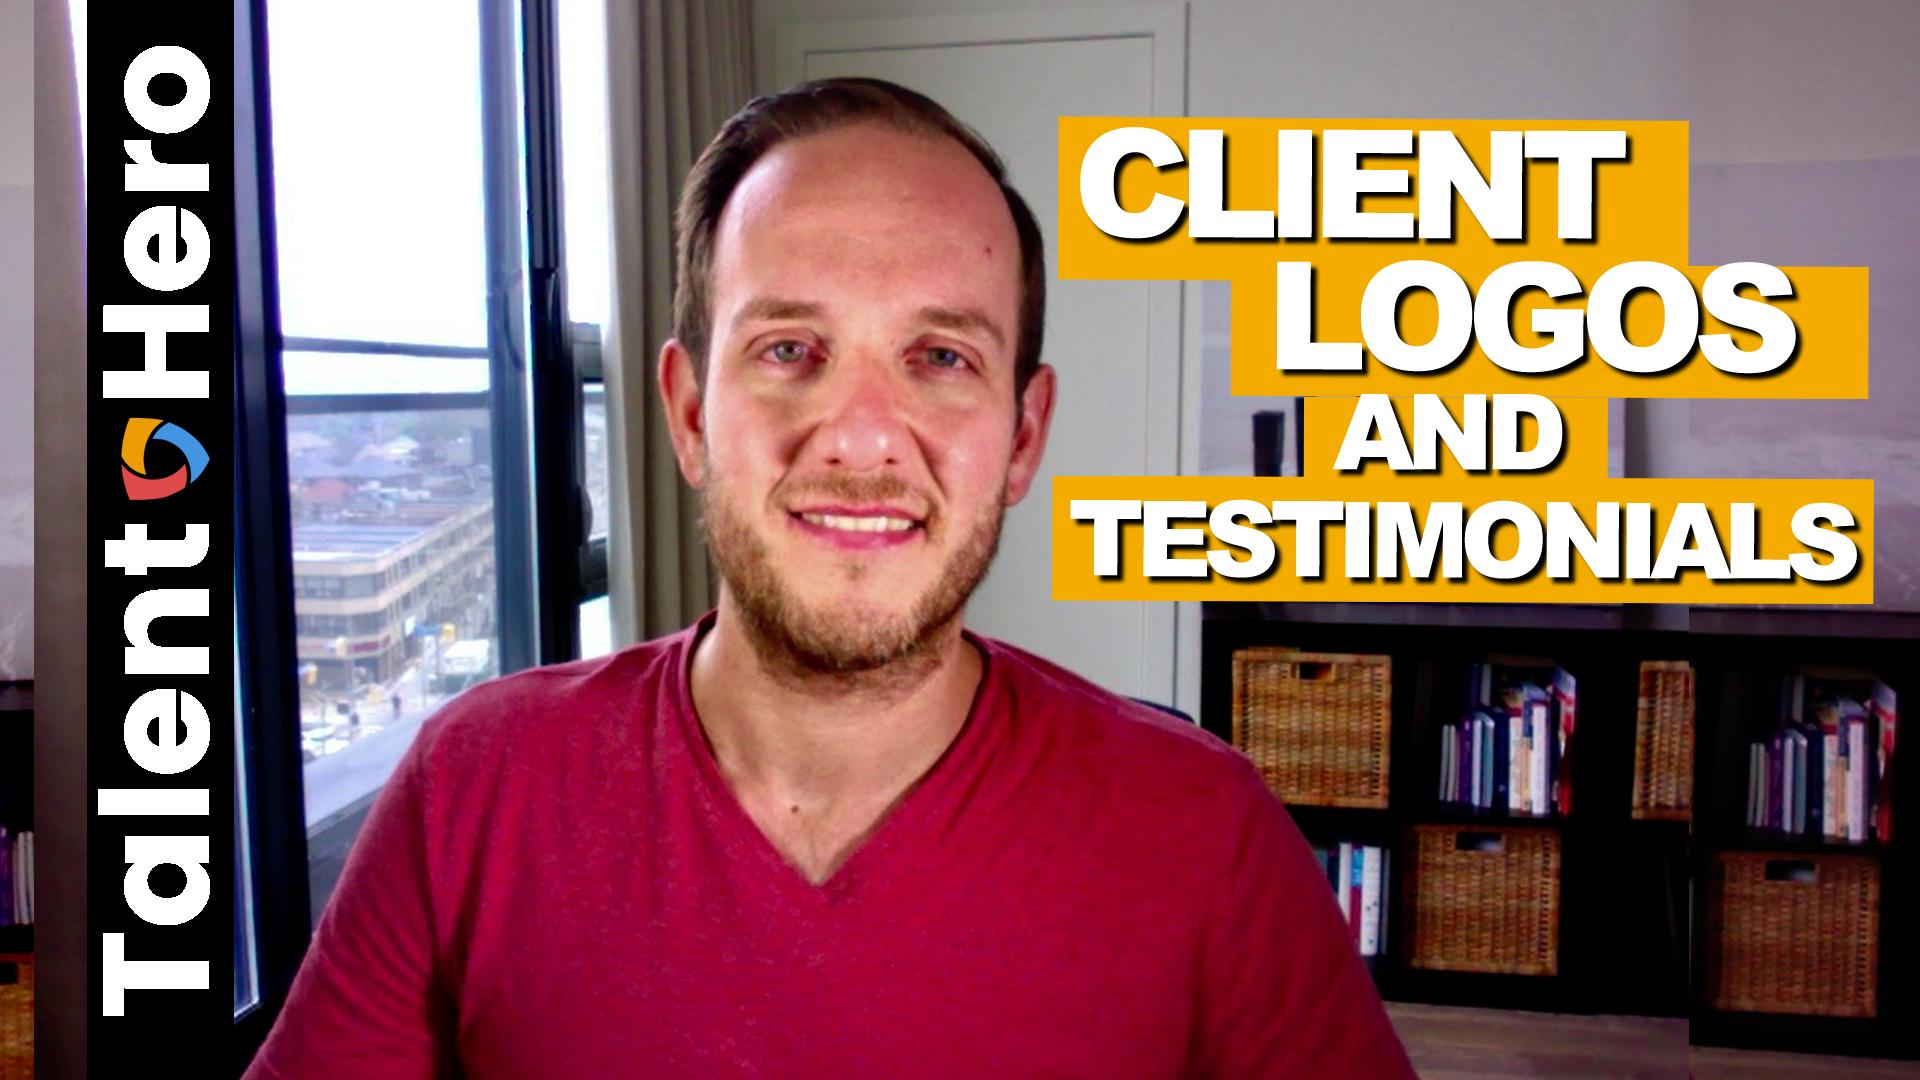 Client Logos and Testimonials Thumbnail